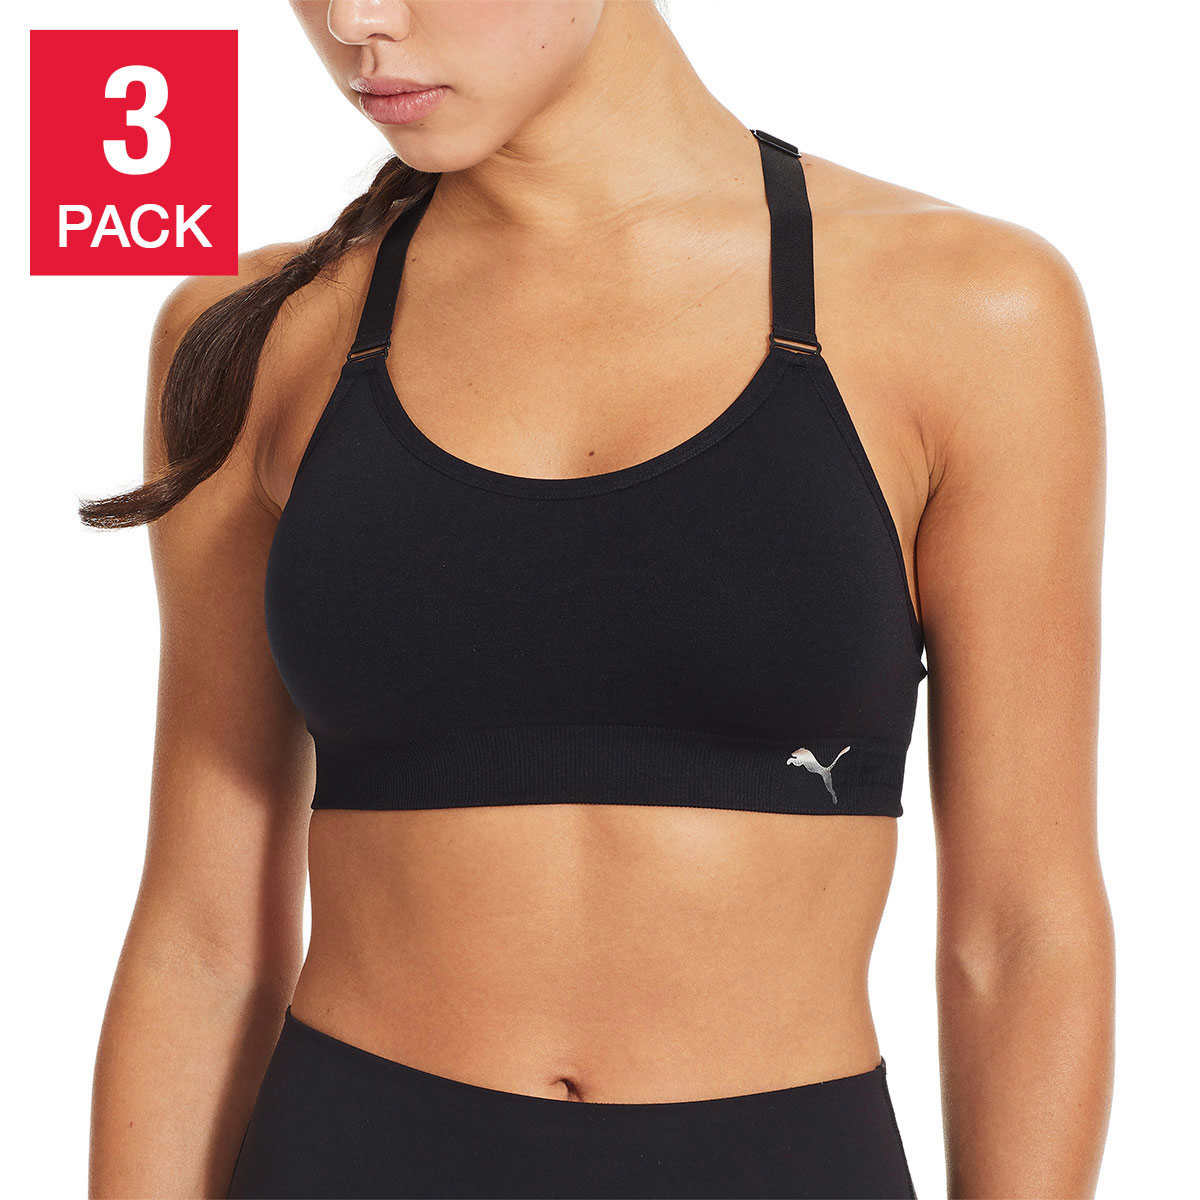 Puma Ladies' Sports Bra, 3-pack | Costco